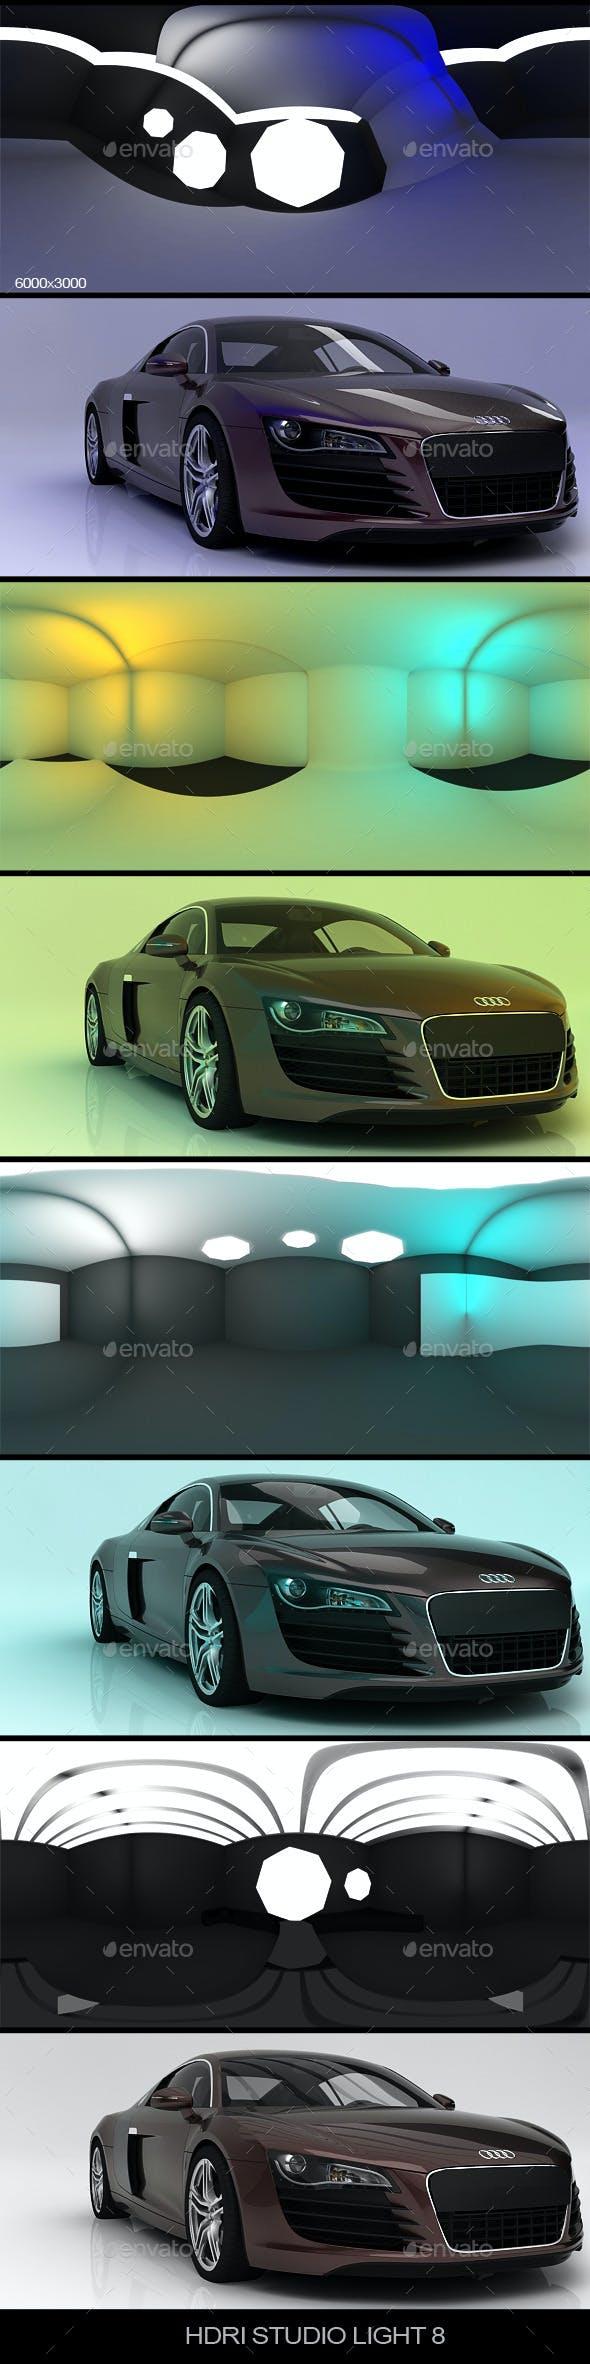 Studio light 10 - 3DOcean Item for Sale